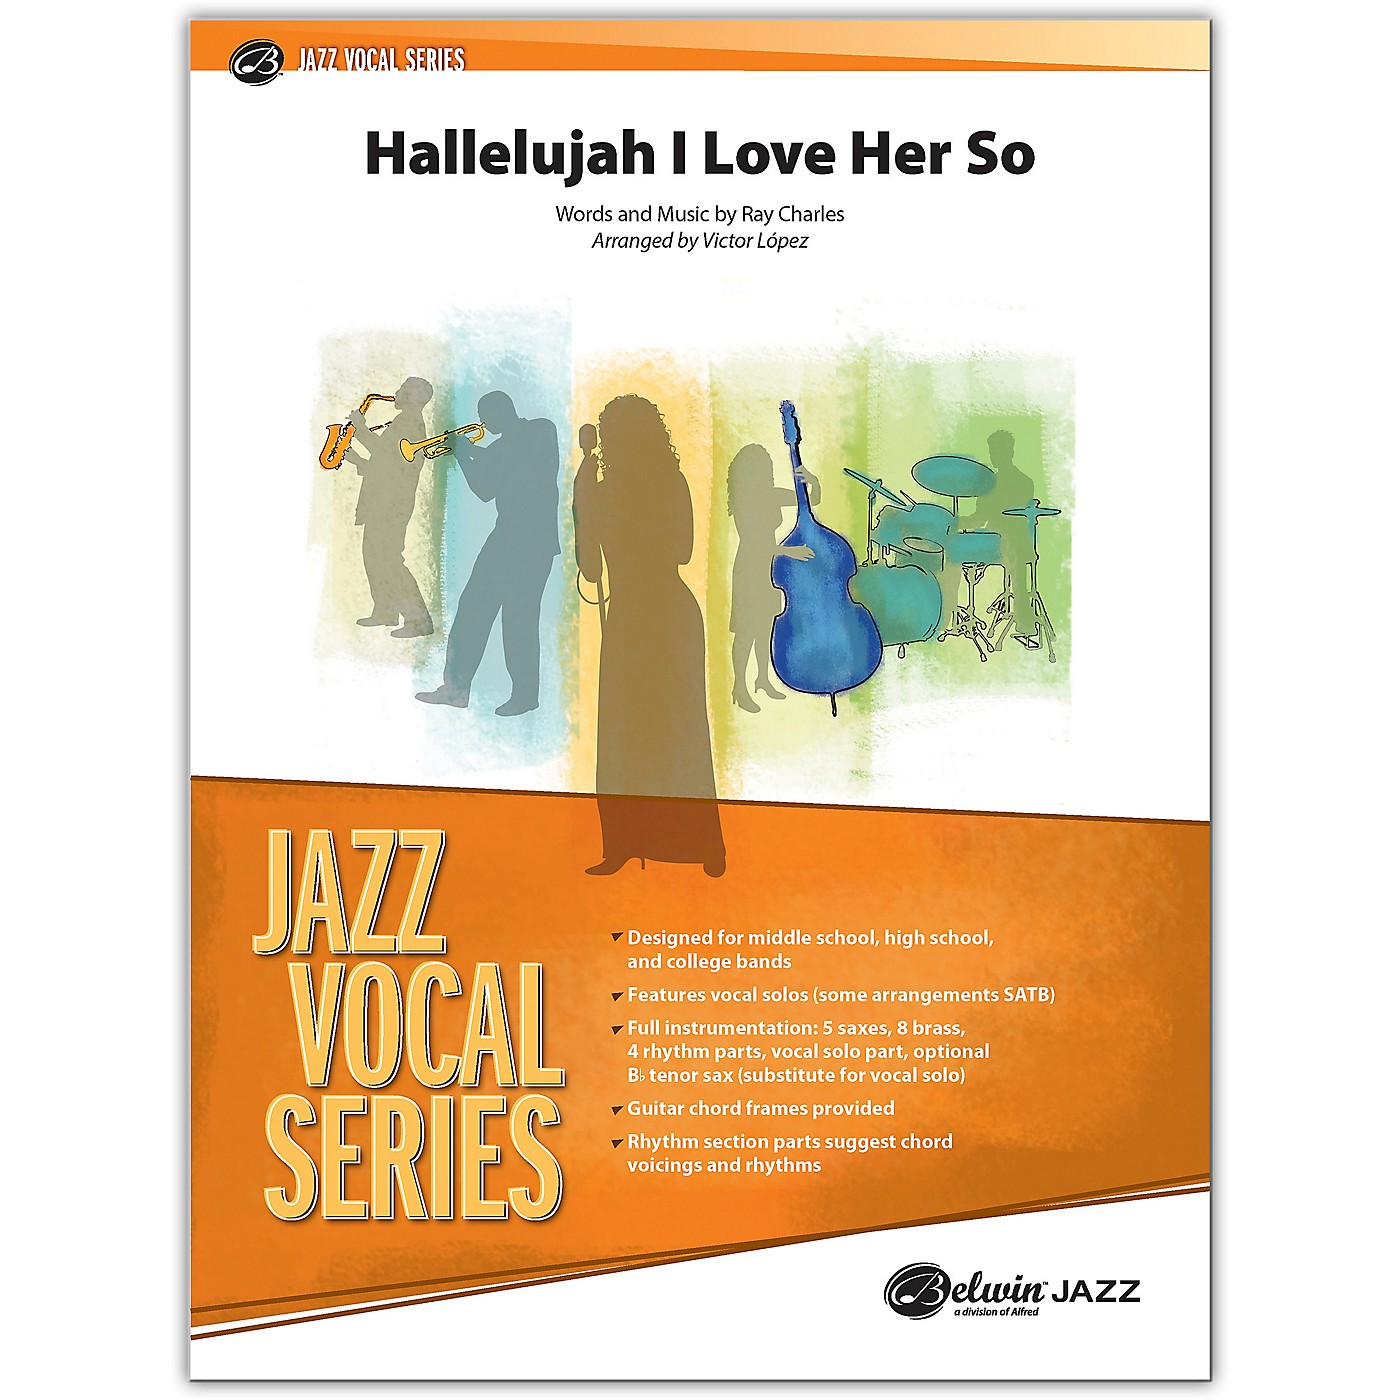 BELWIN Hallelujah I Love Her So Conductor Score 3 (Medium) thumbnail